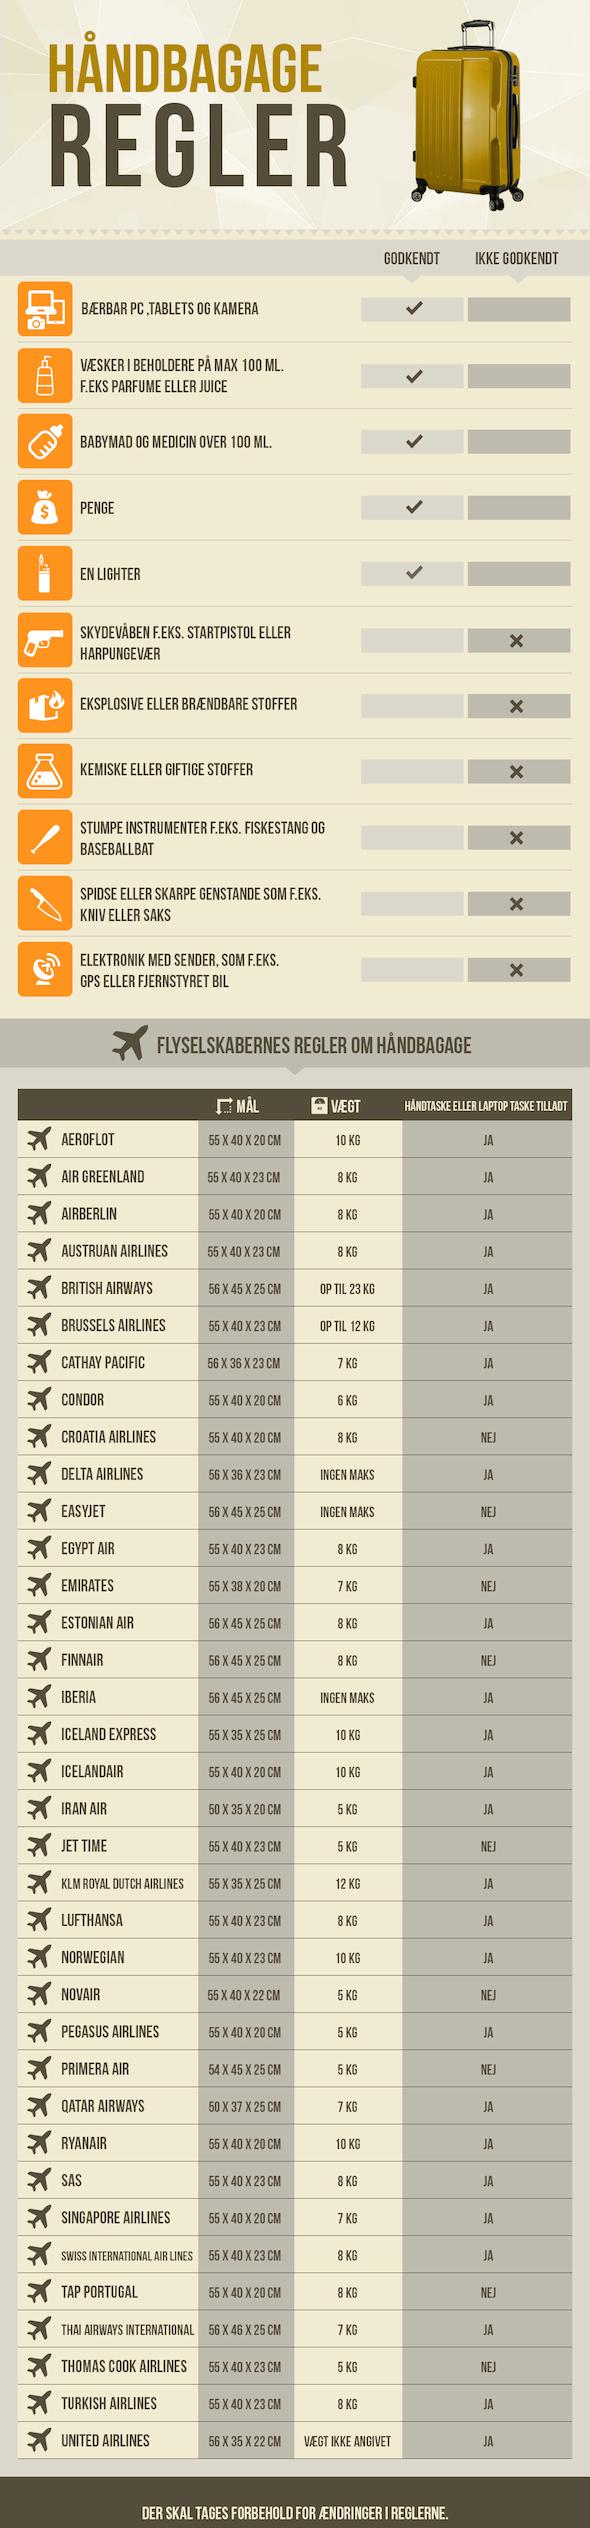 Håndbagage-regler